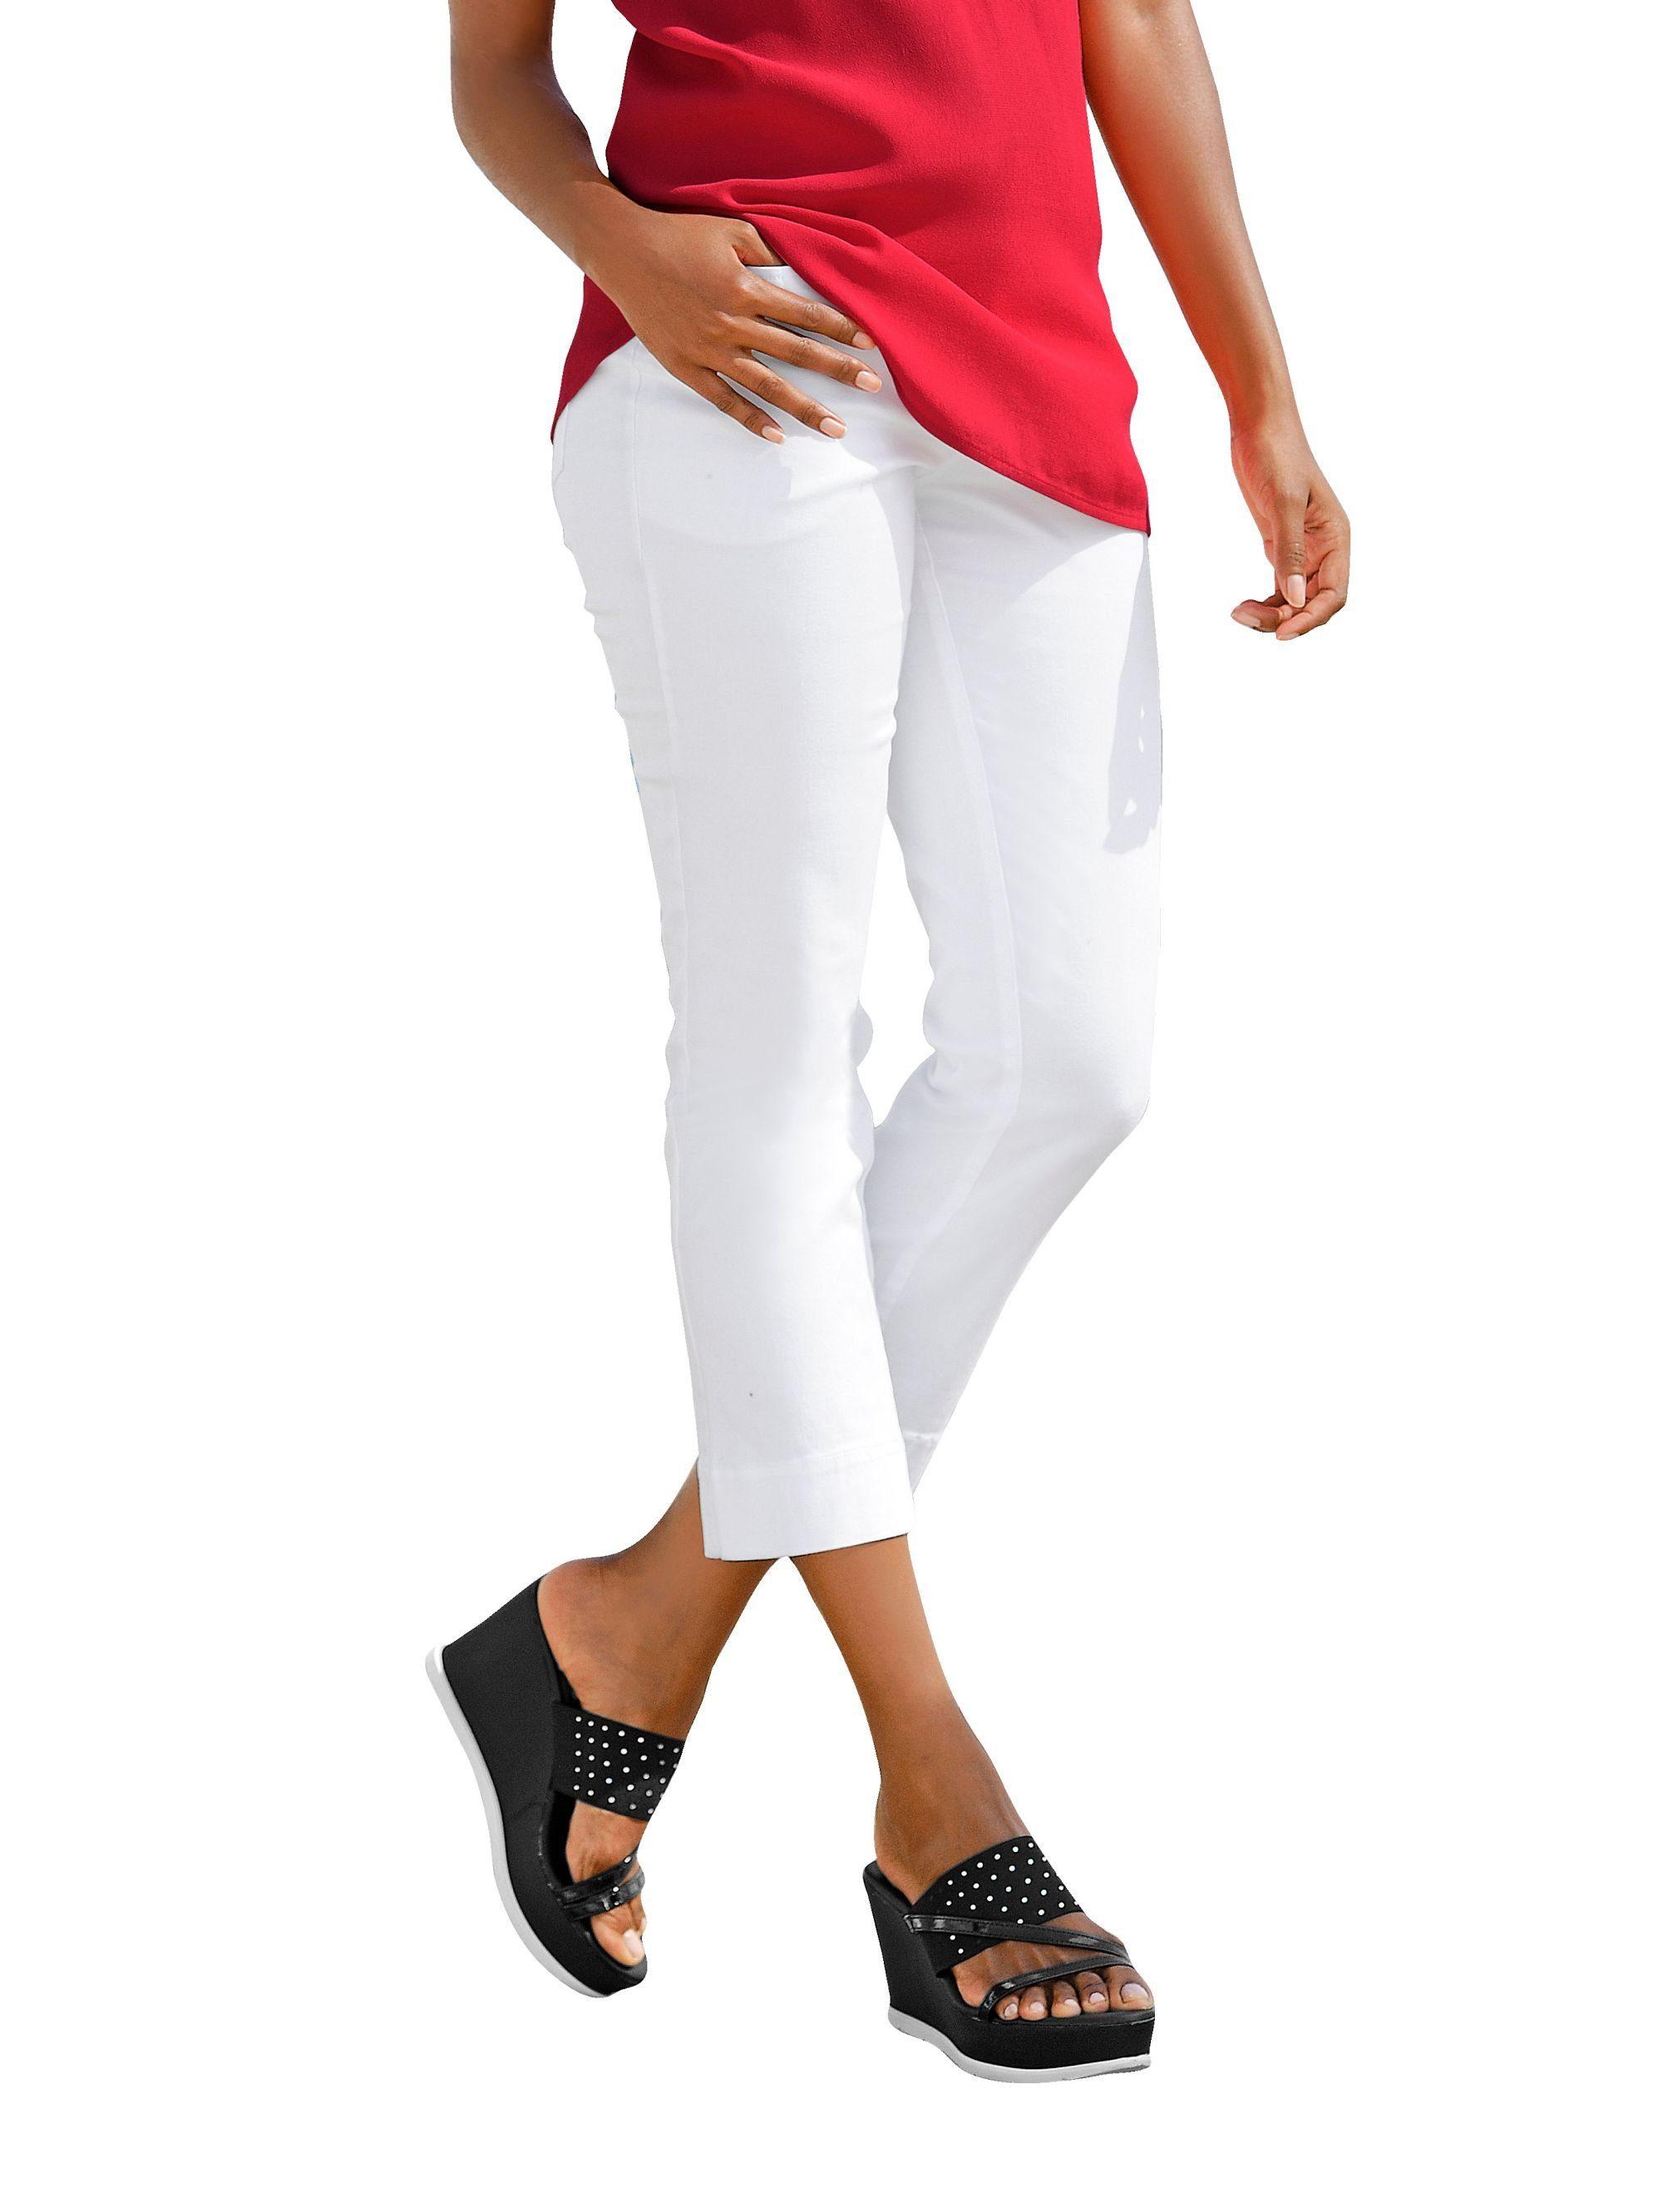 Alba Moda 7/8-Jeans mit Krempelsaum | Bekleidung > Jeans > 7/8-Jeans | Alba Moda